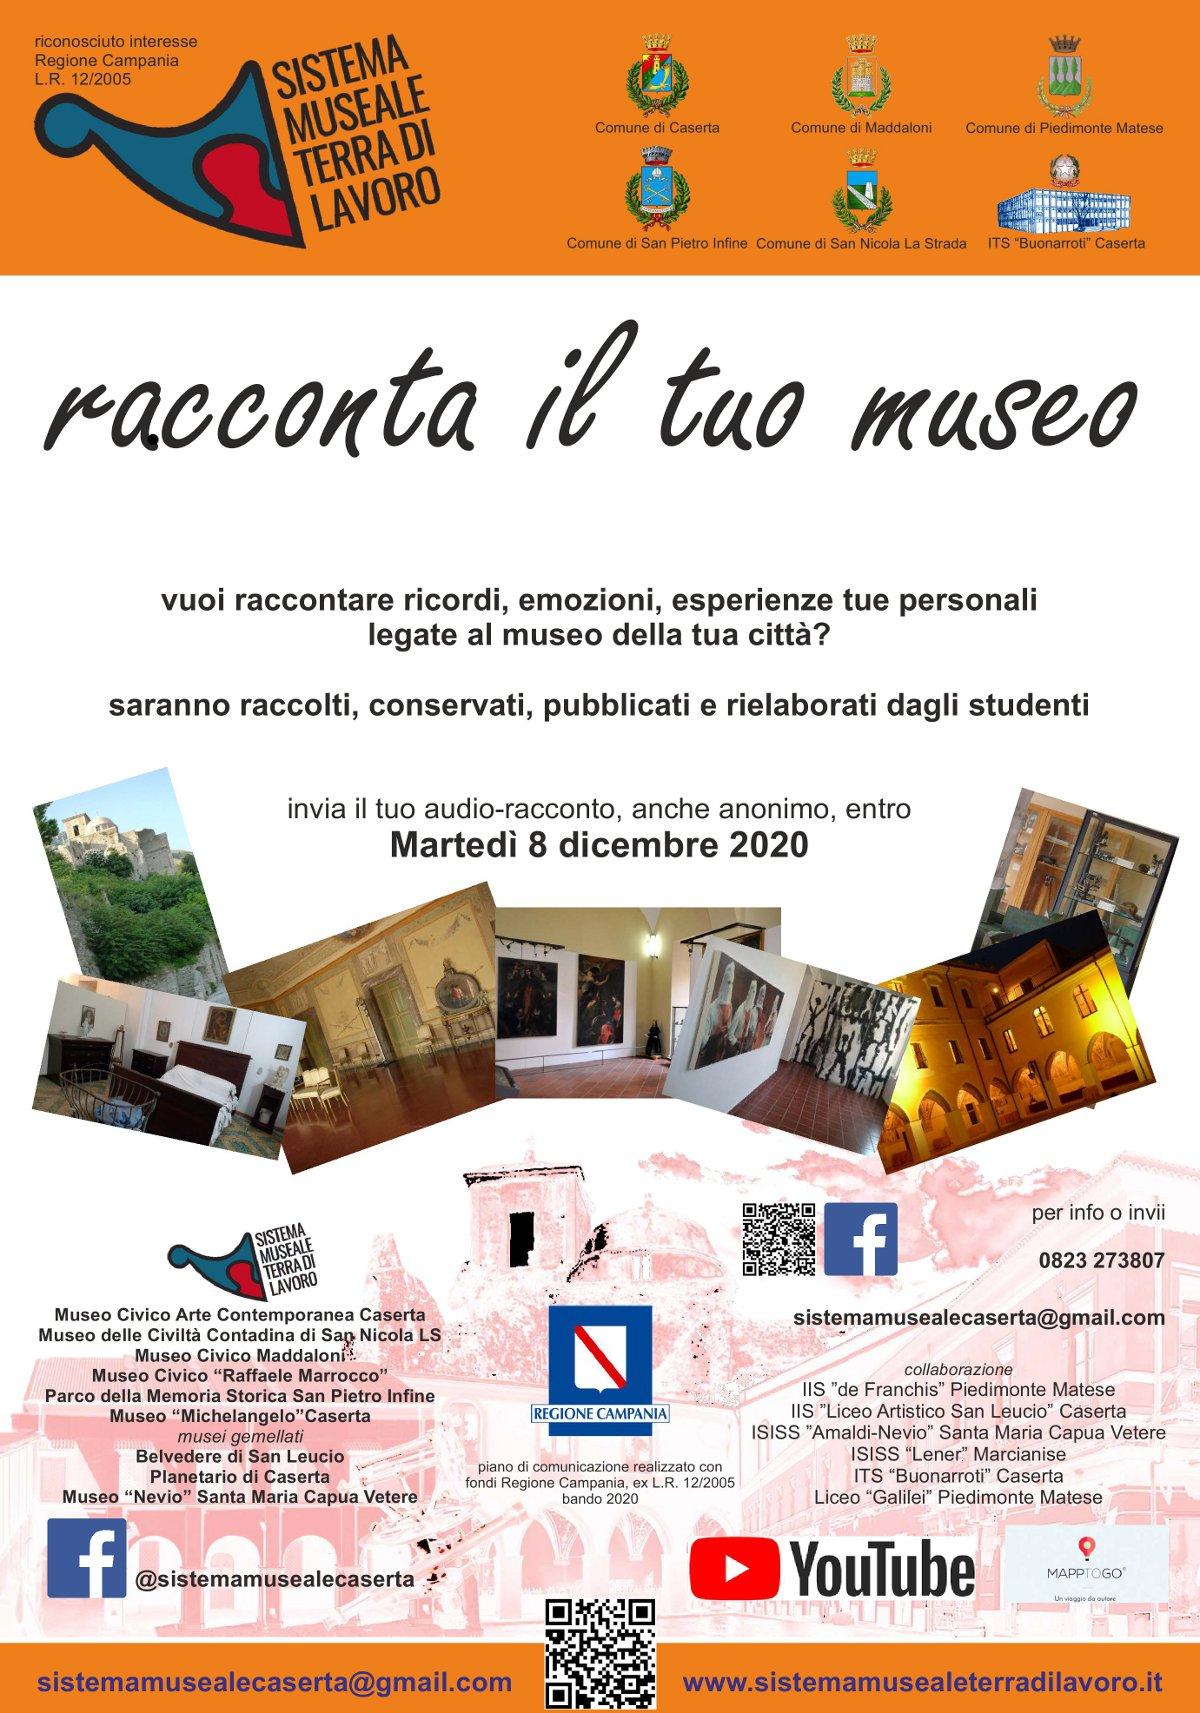 manifesto_sistemamuseale_w